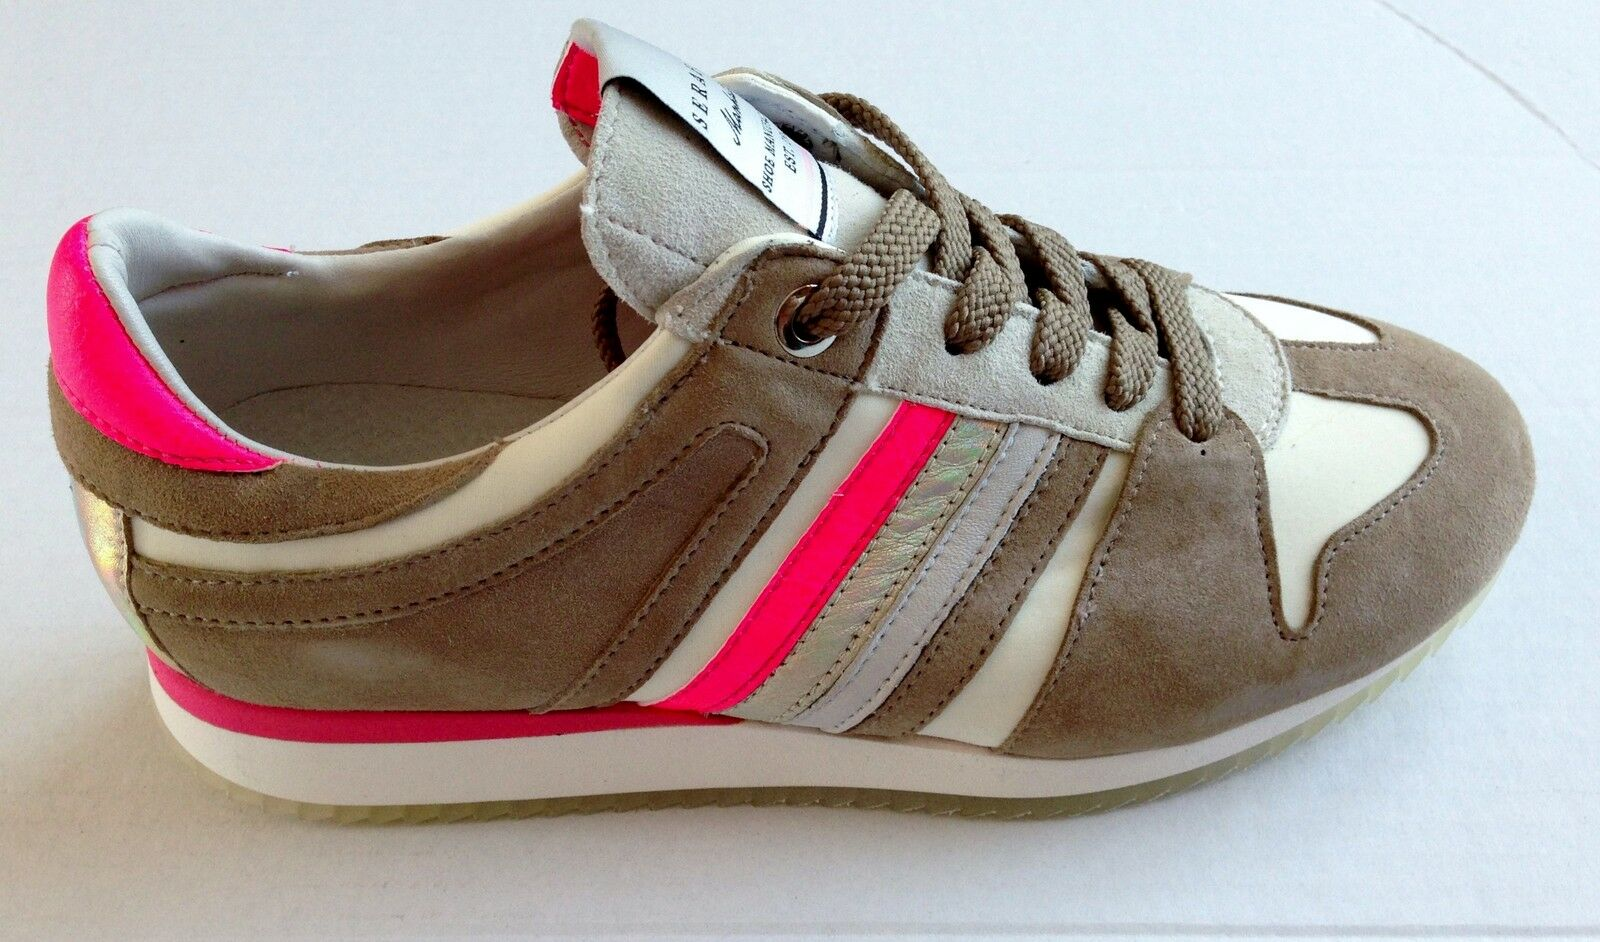 Serafini shoes Manhattan scarpe sneakers pelle shoes Serafini Donna Women 2782/3 08744e